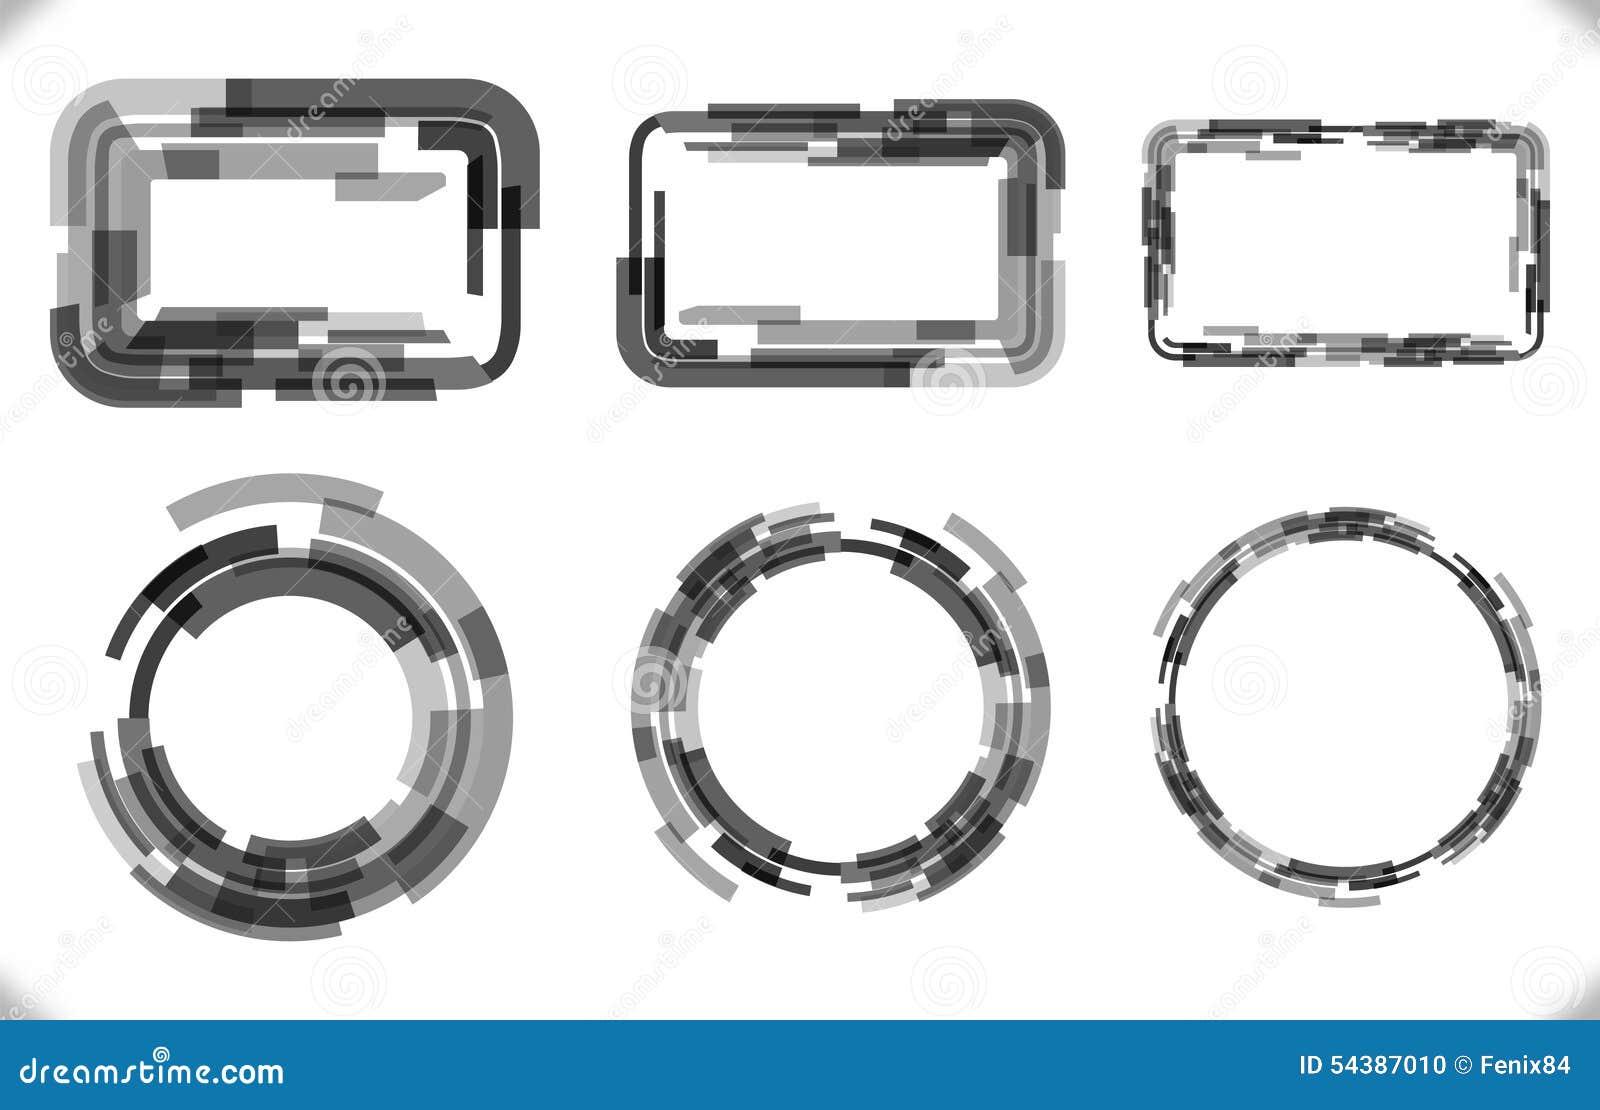 set of techno